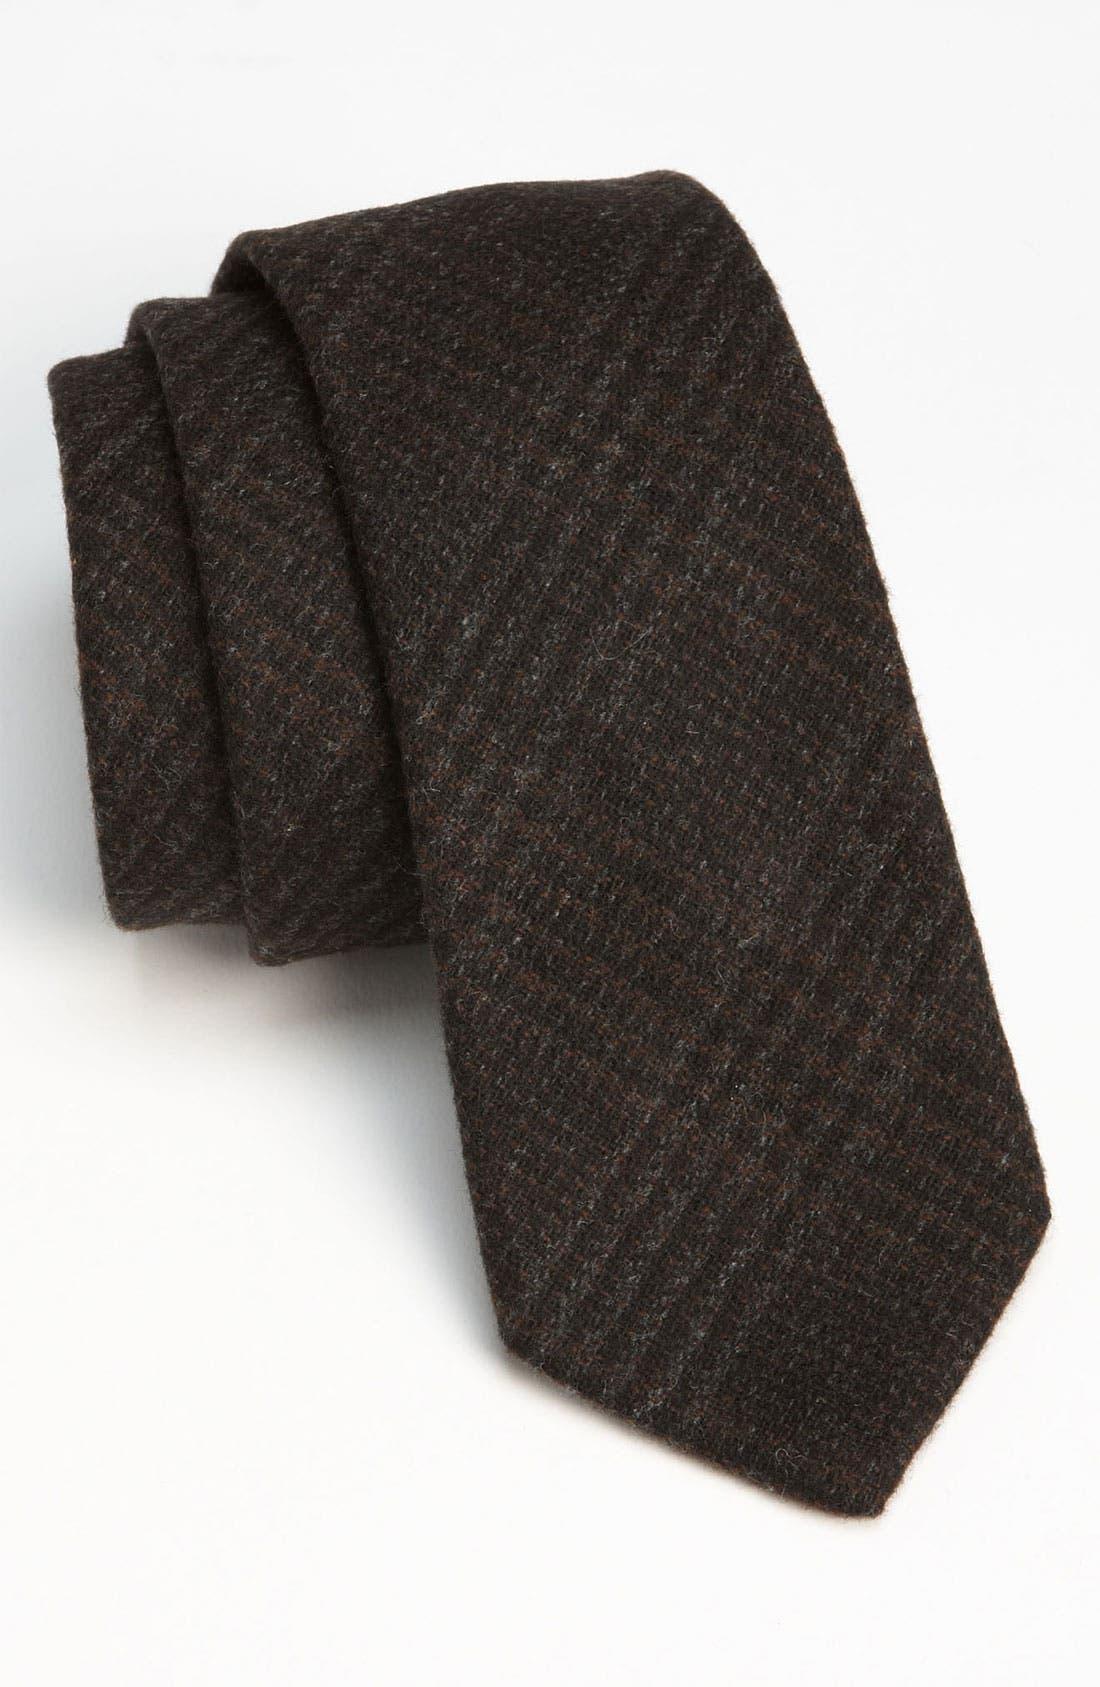 Alternate Image 1 Selected - Gitman Woven Wool Tie